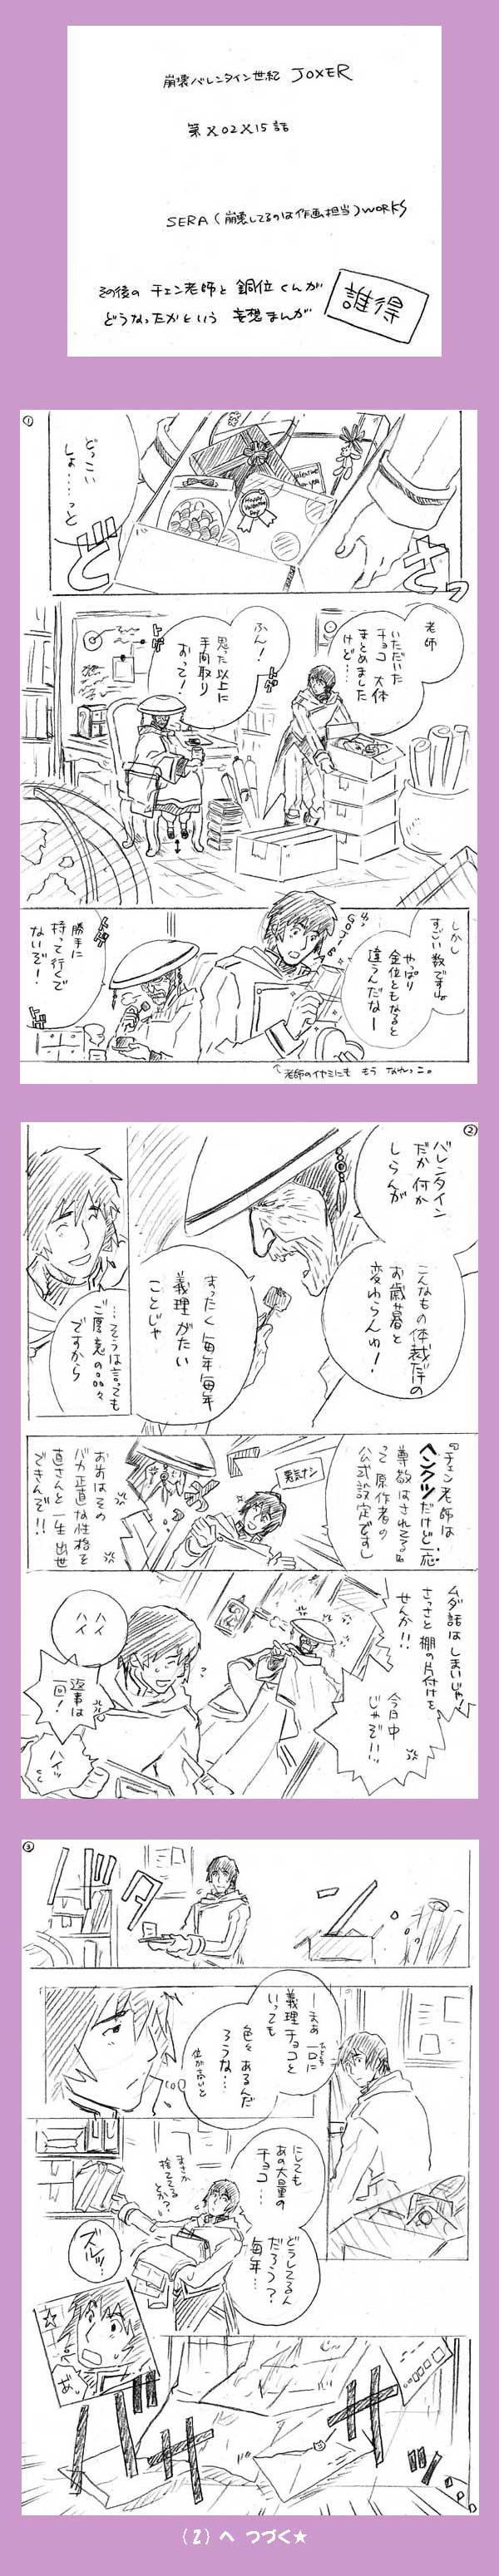 15VD2_mae.jpg